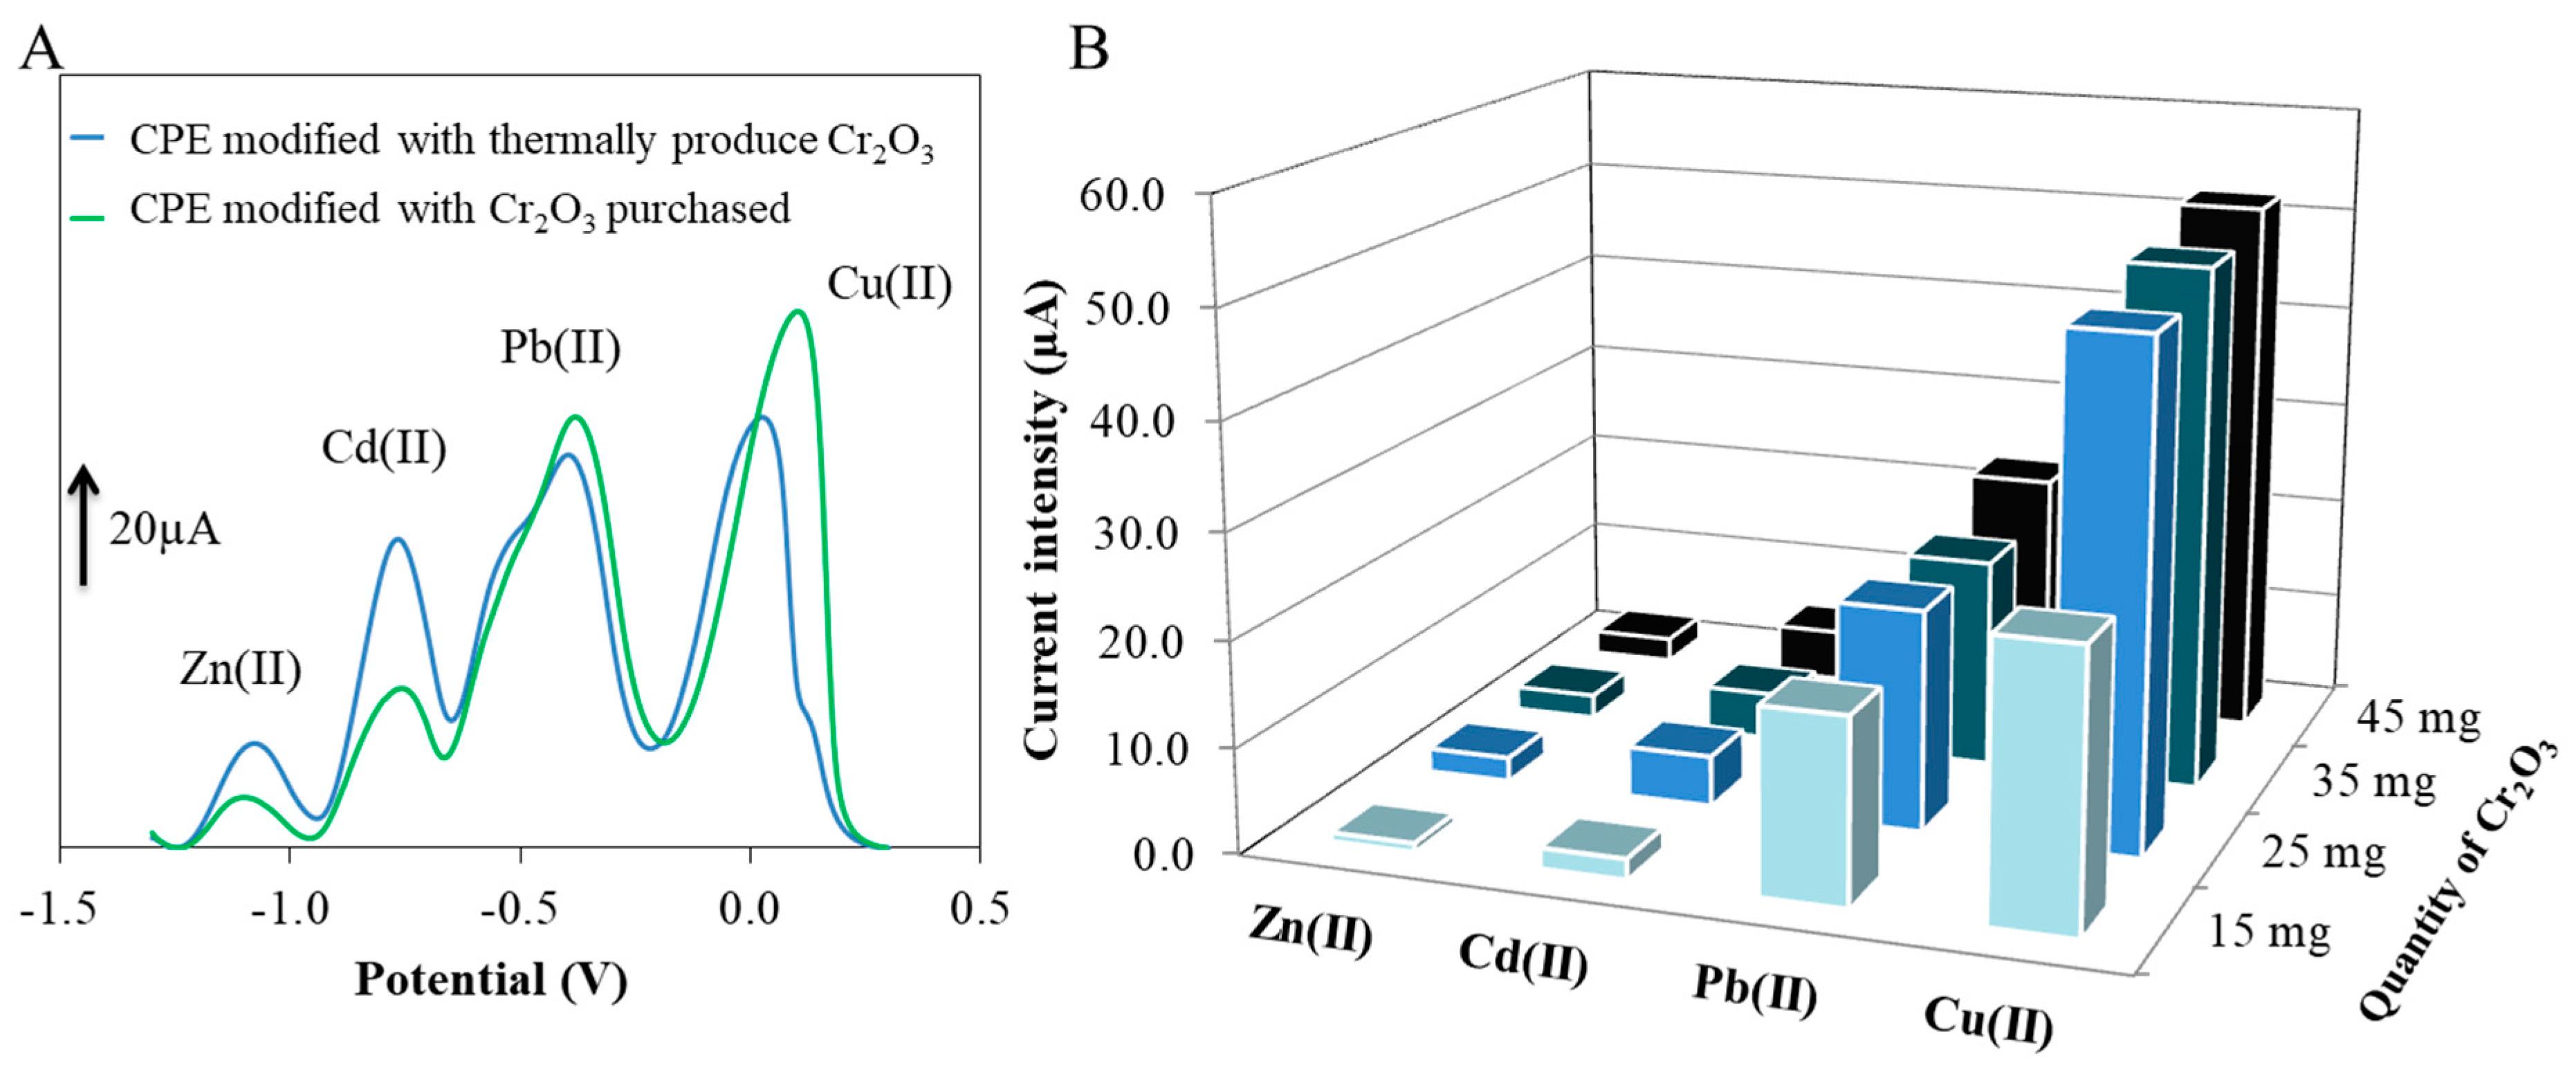 Determination of lead and cadmium contents